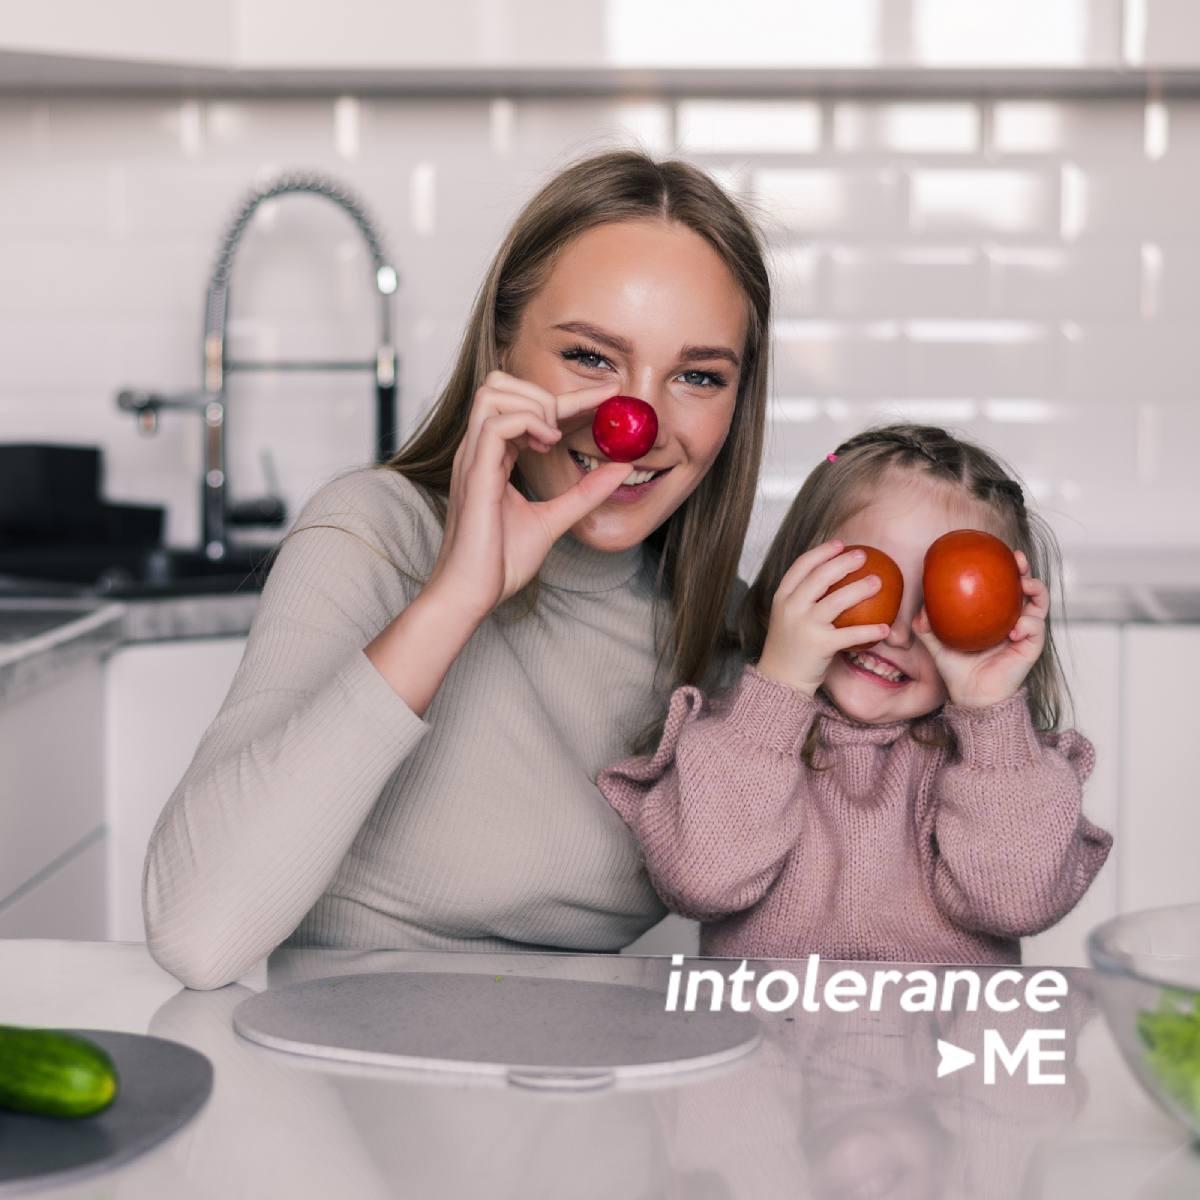 Intolerance Me can prevent illness